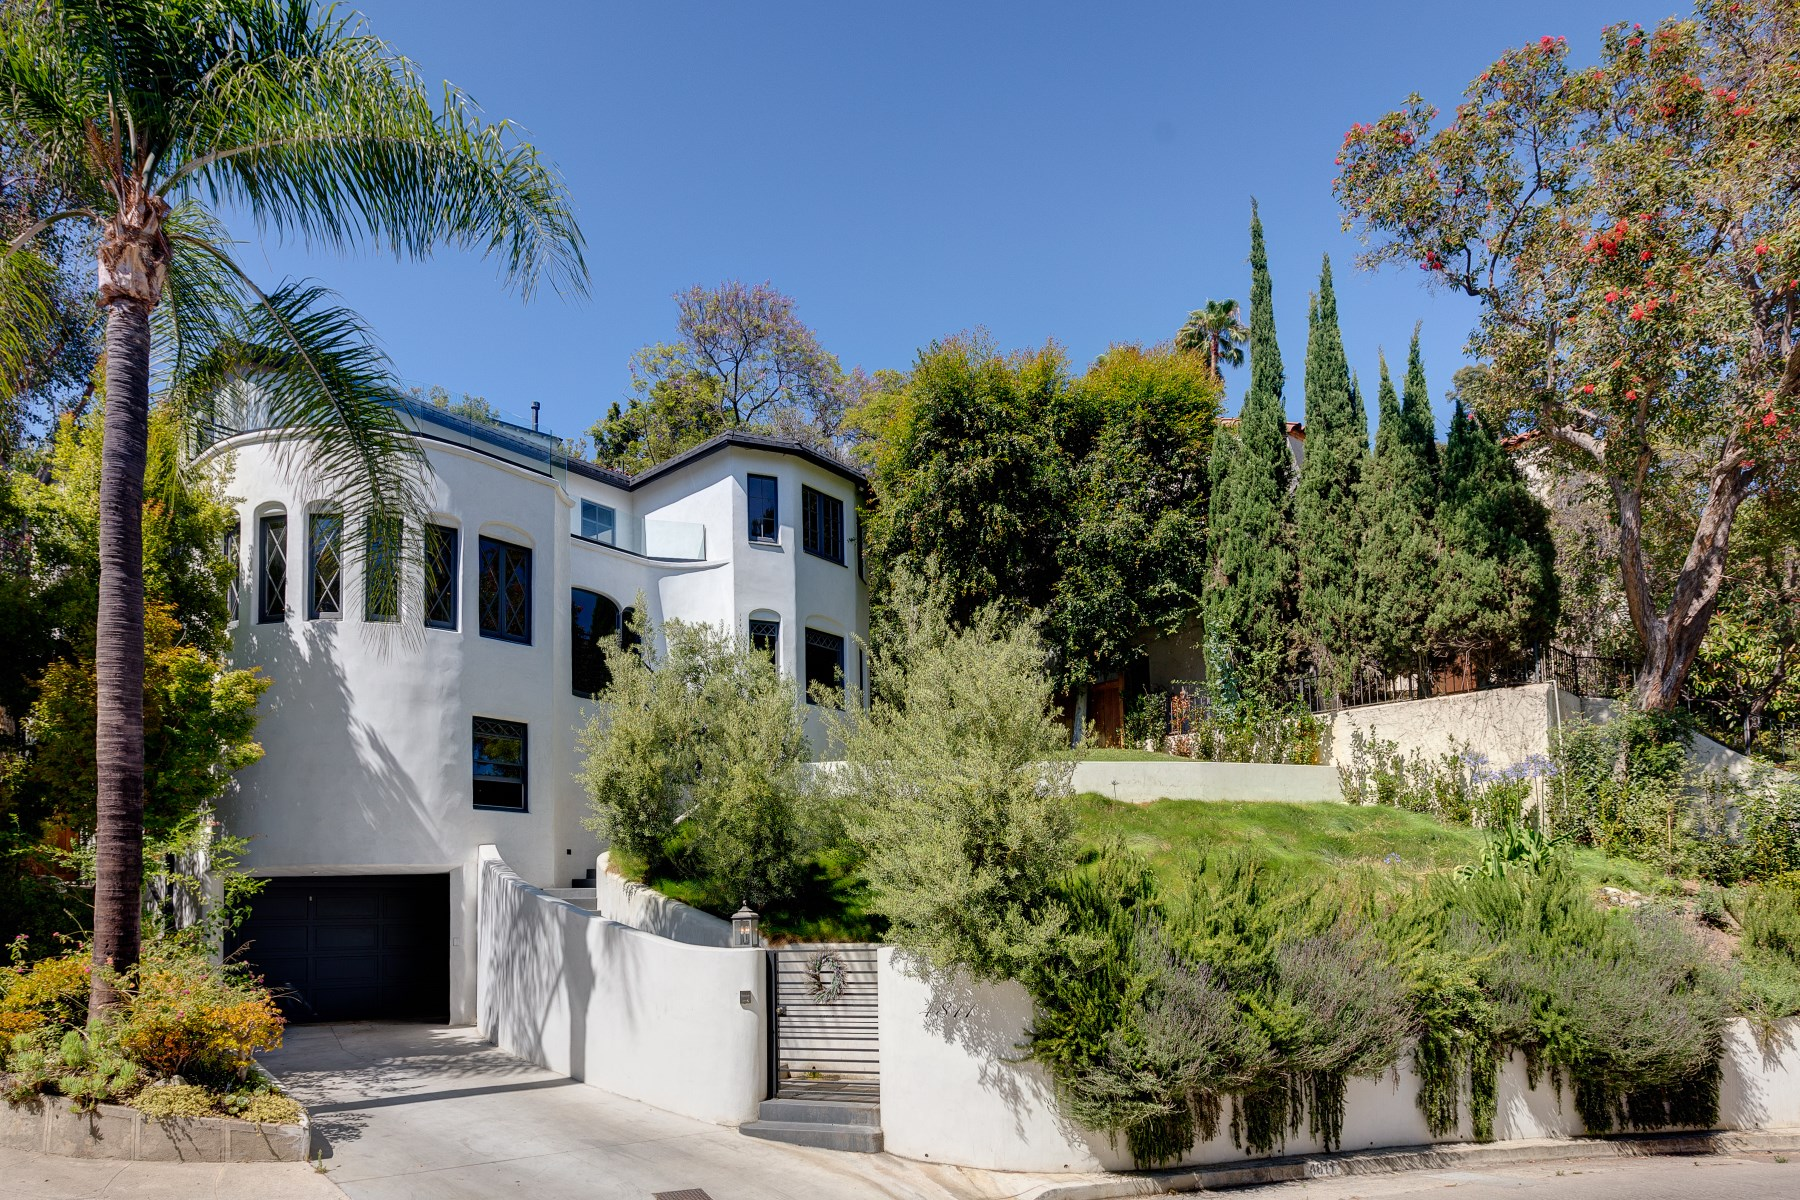 Single Family Home for Sale at 4811 Bonvue Avenue Los Feliz, Los Angeles, California, 90027 United States